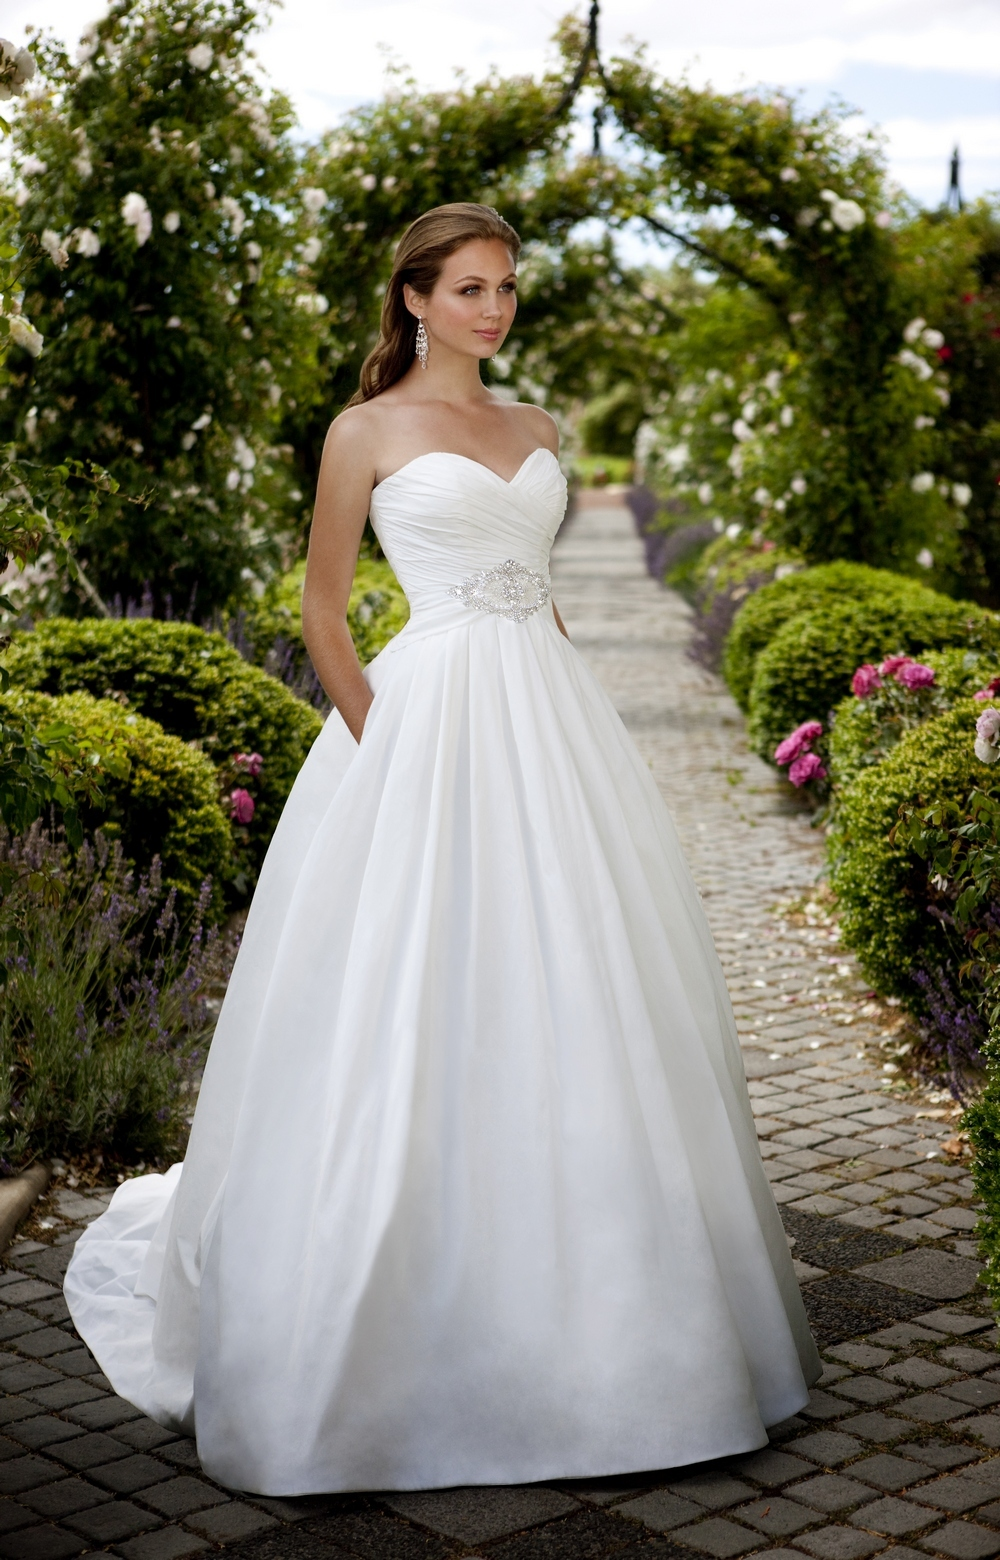 Essense-of-australia-wedding-dresses-2010-2011-d1103.full